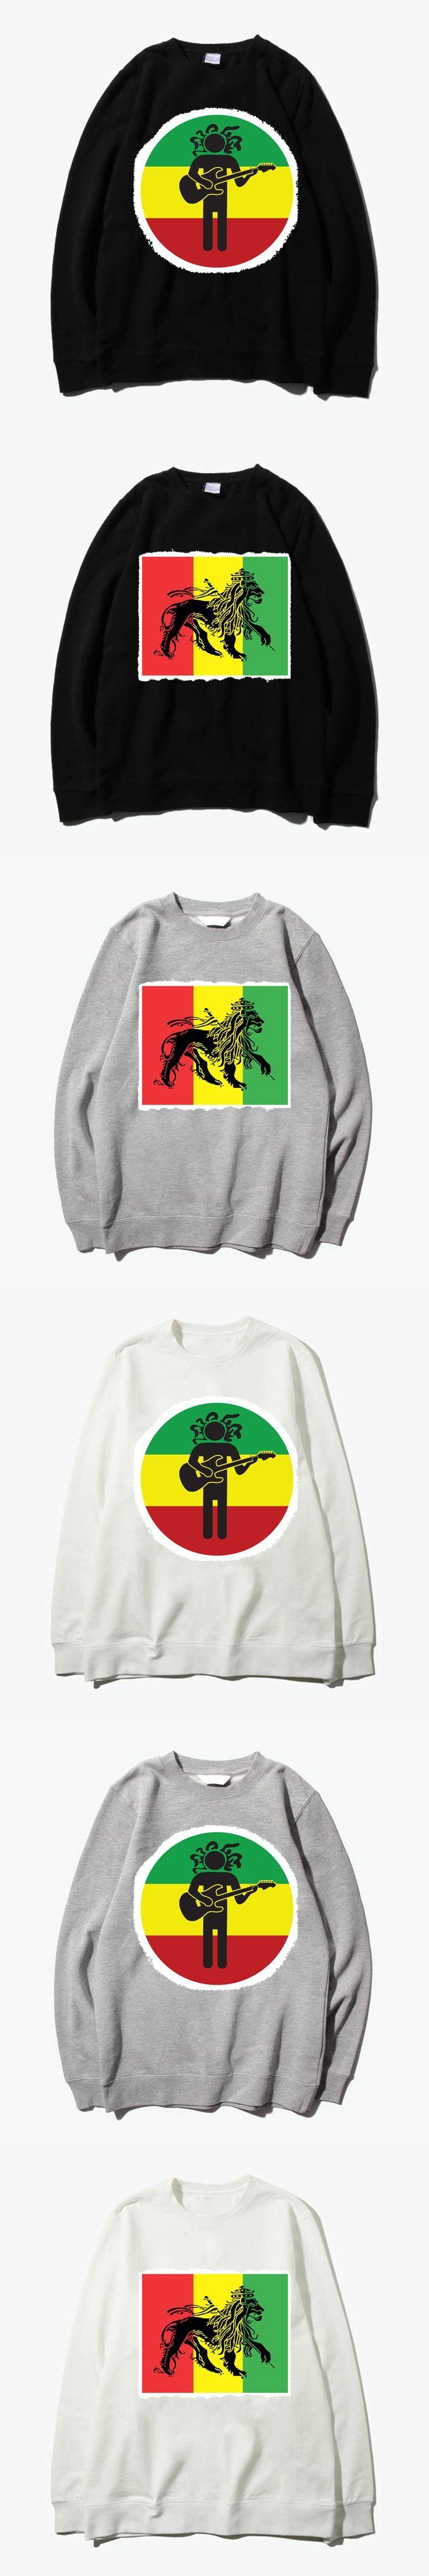 reggae lion rasta man fashion patchwork design o neck sweatshirt